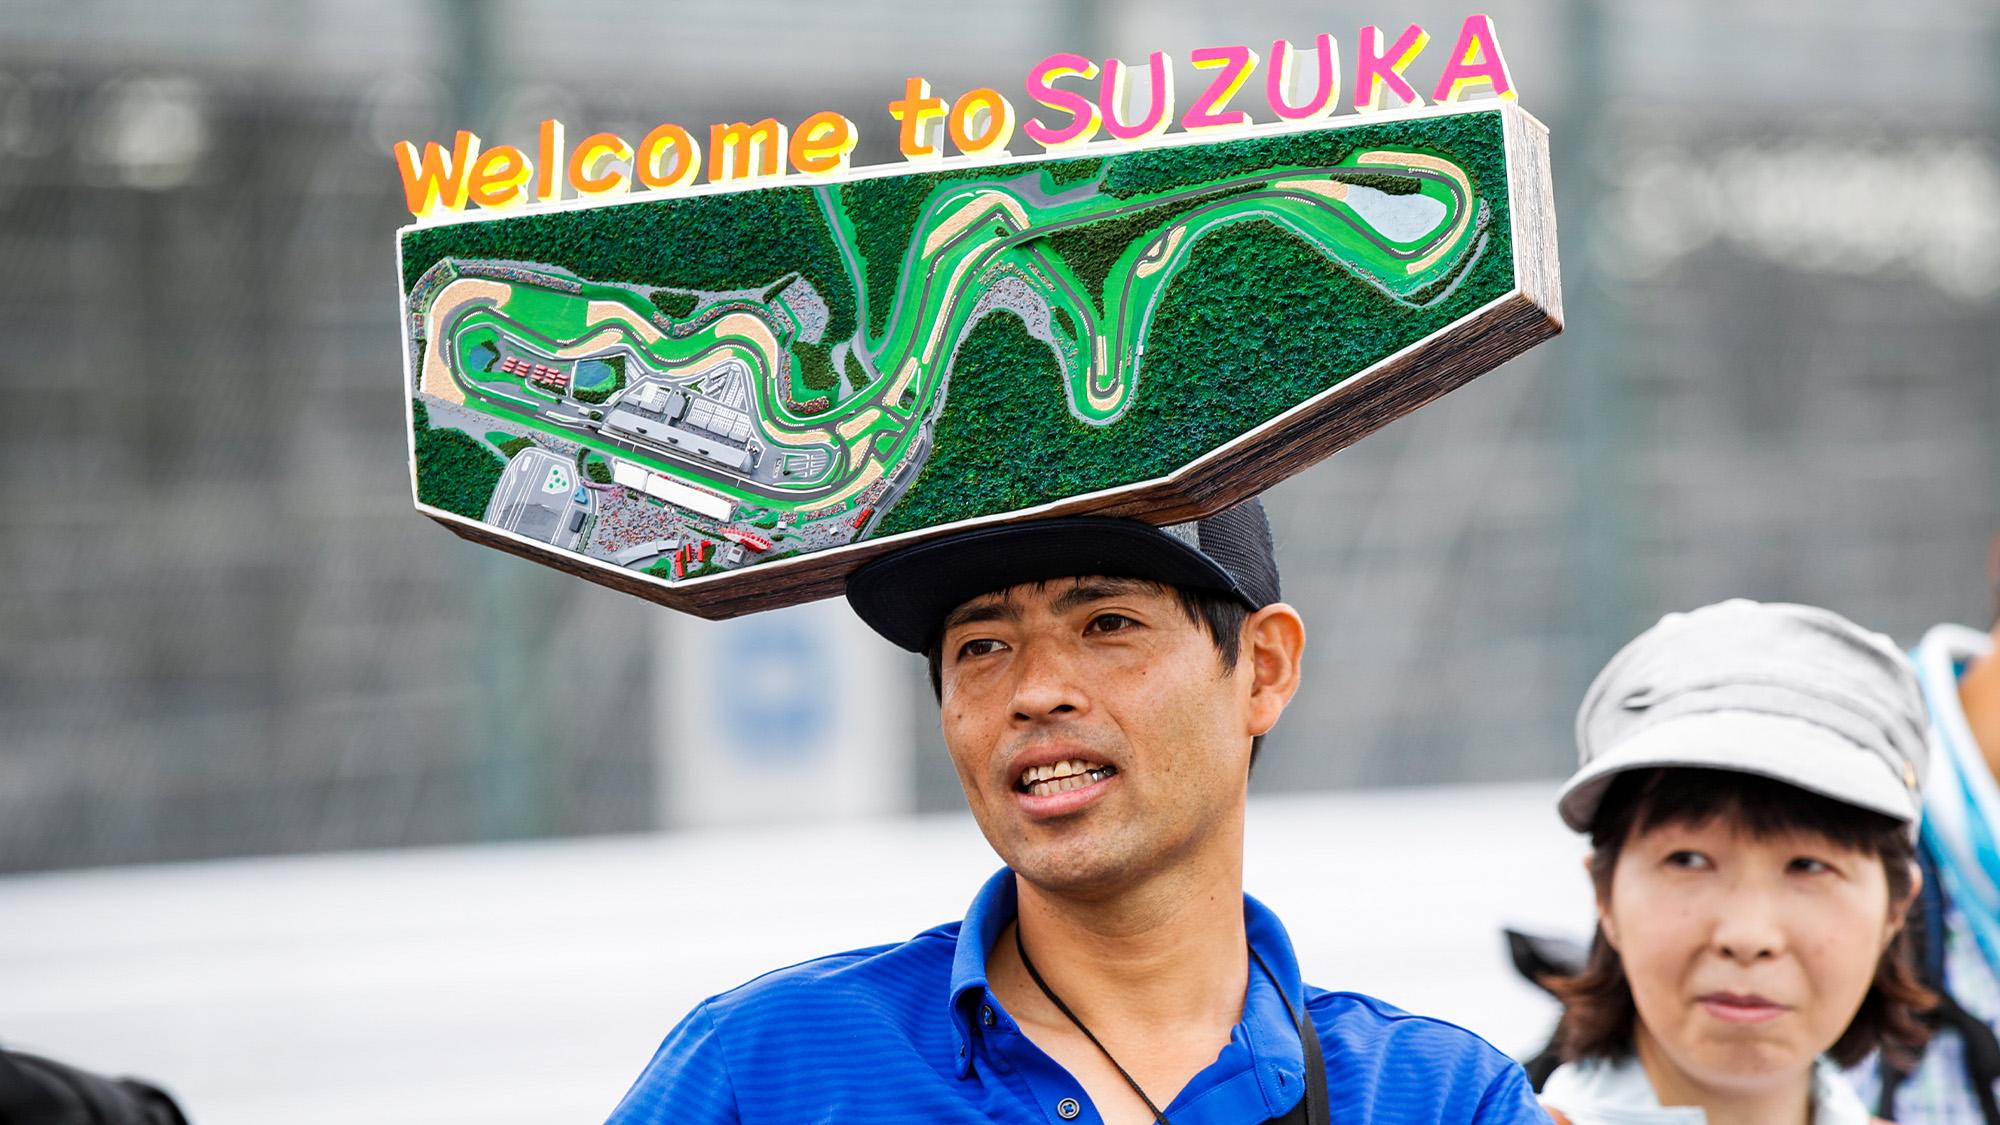 Suzuka track map hat